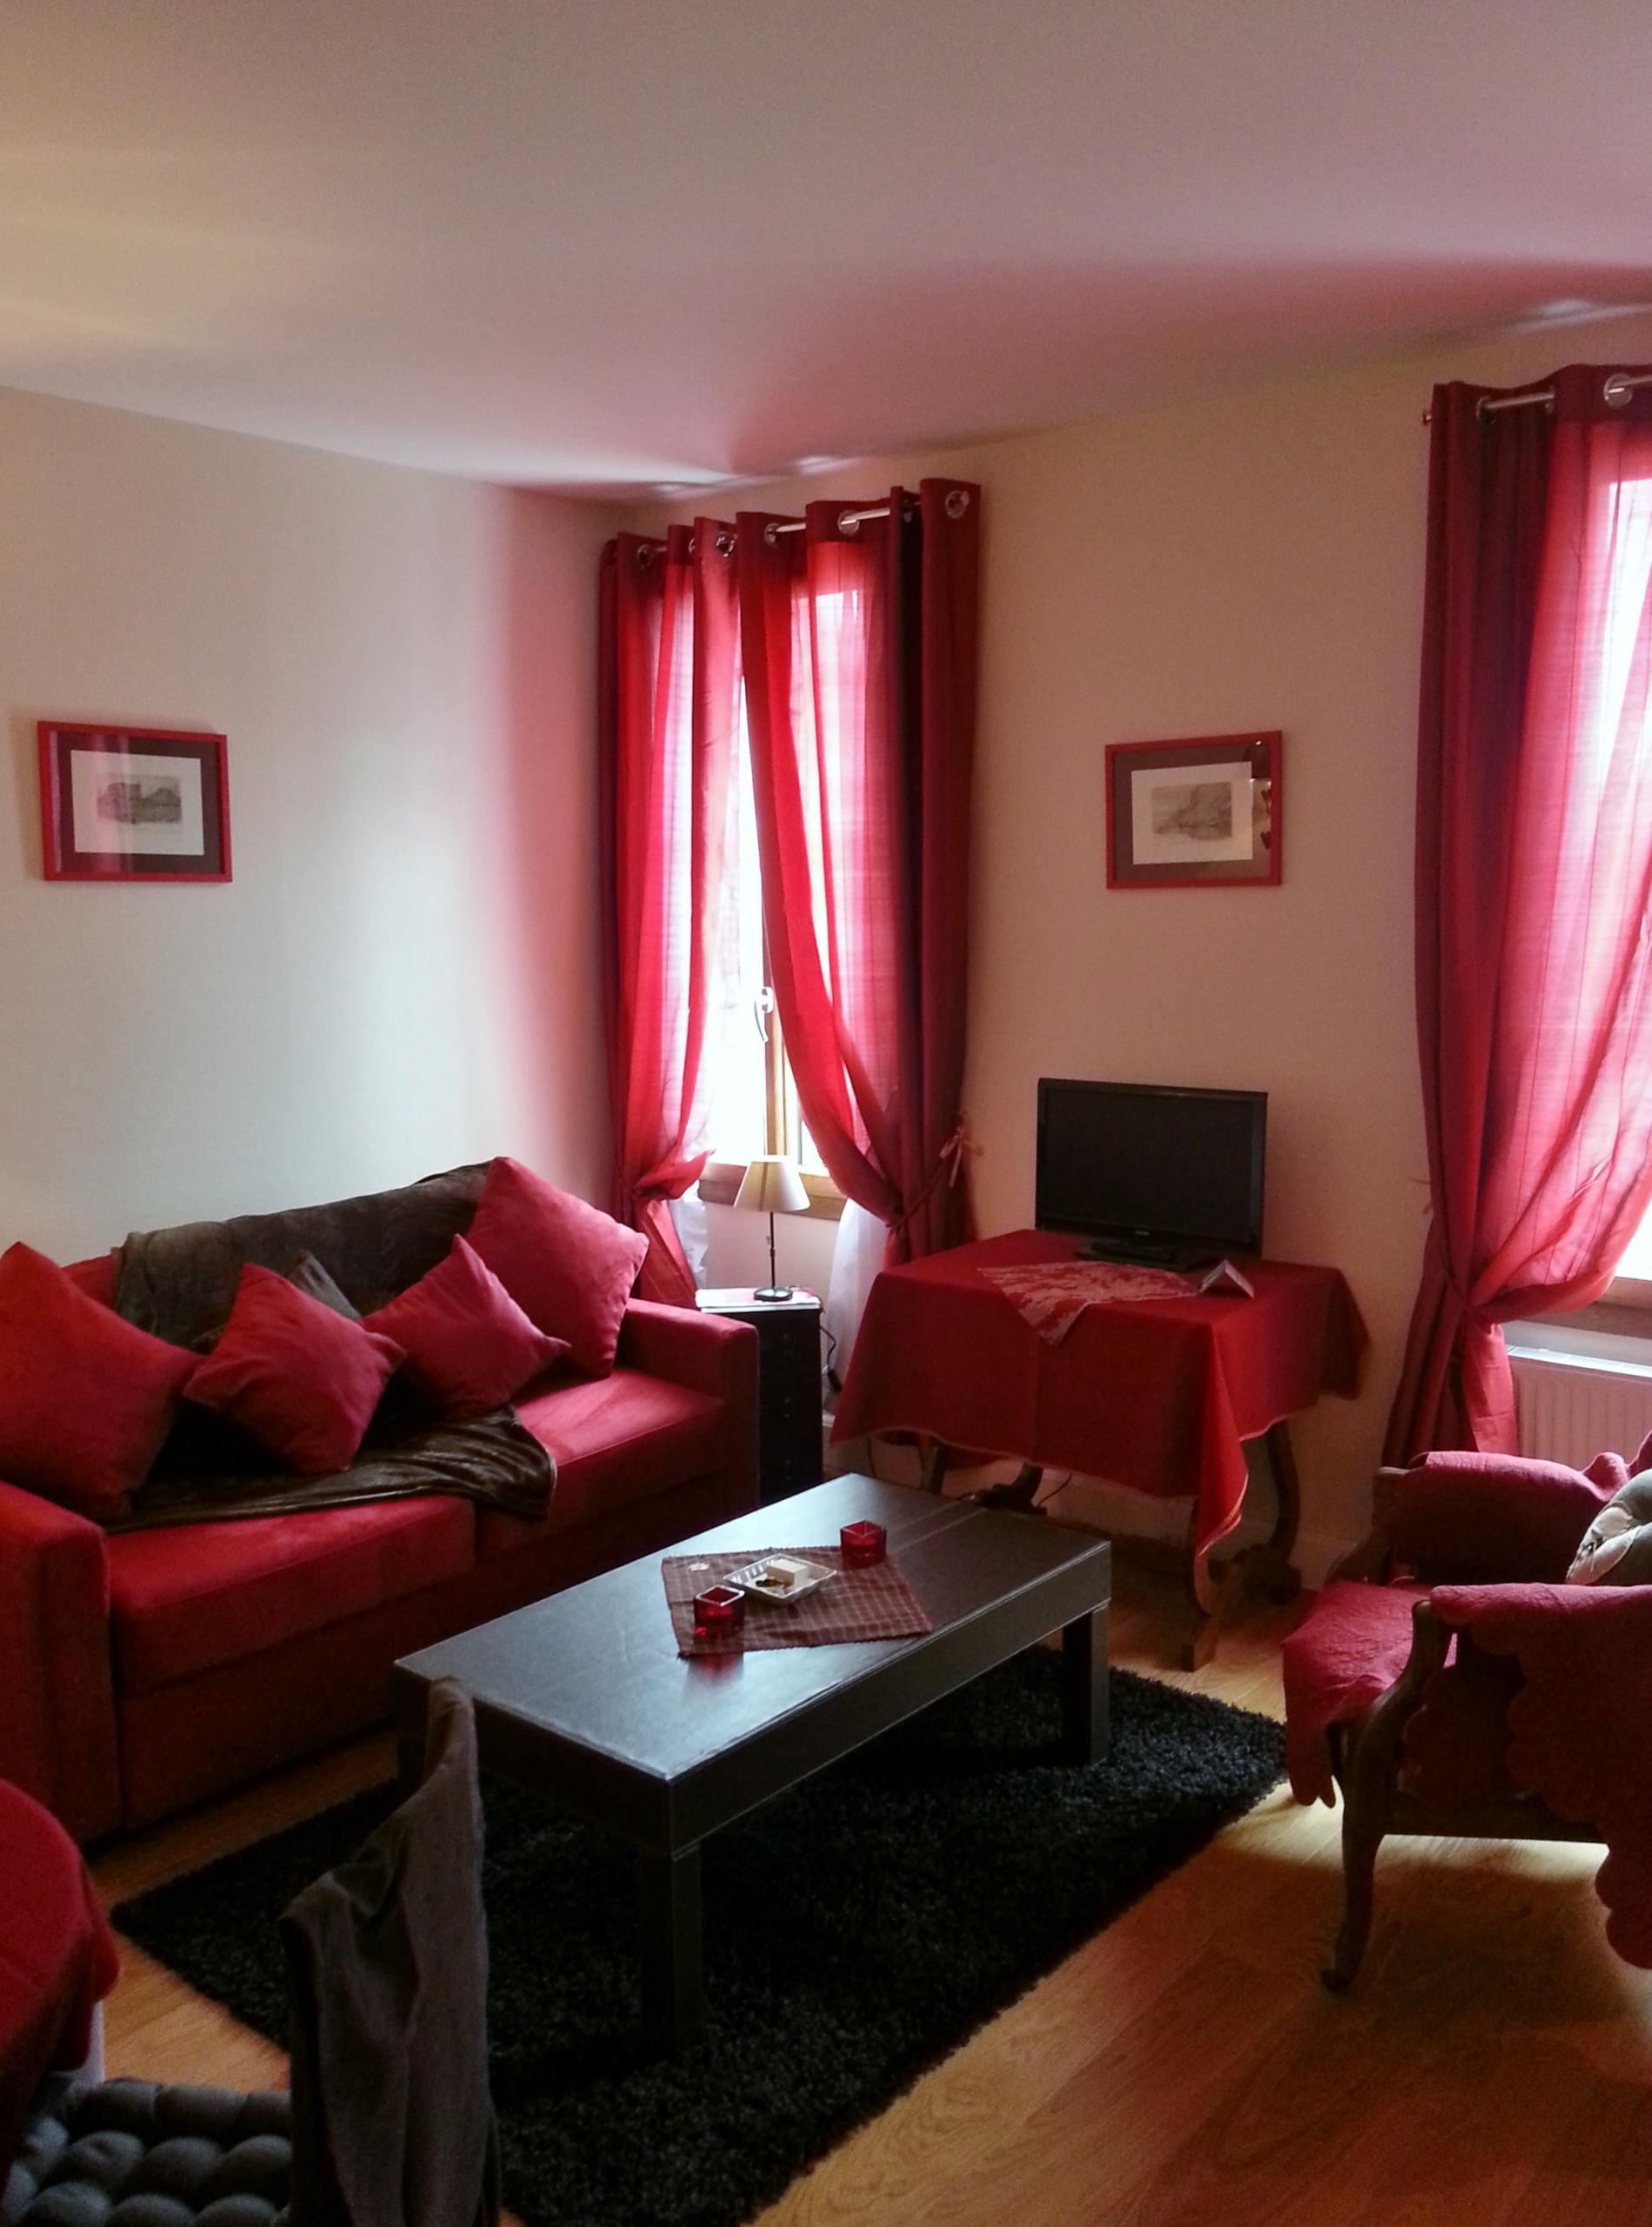 Rooms Hotel Evain Bord Lac Leman Hotel Les Cygnes ***